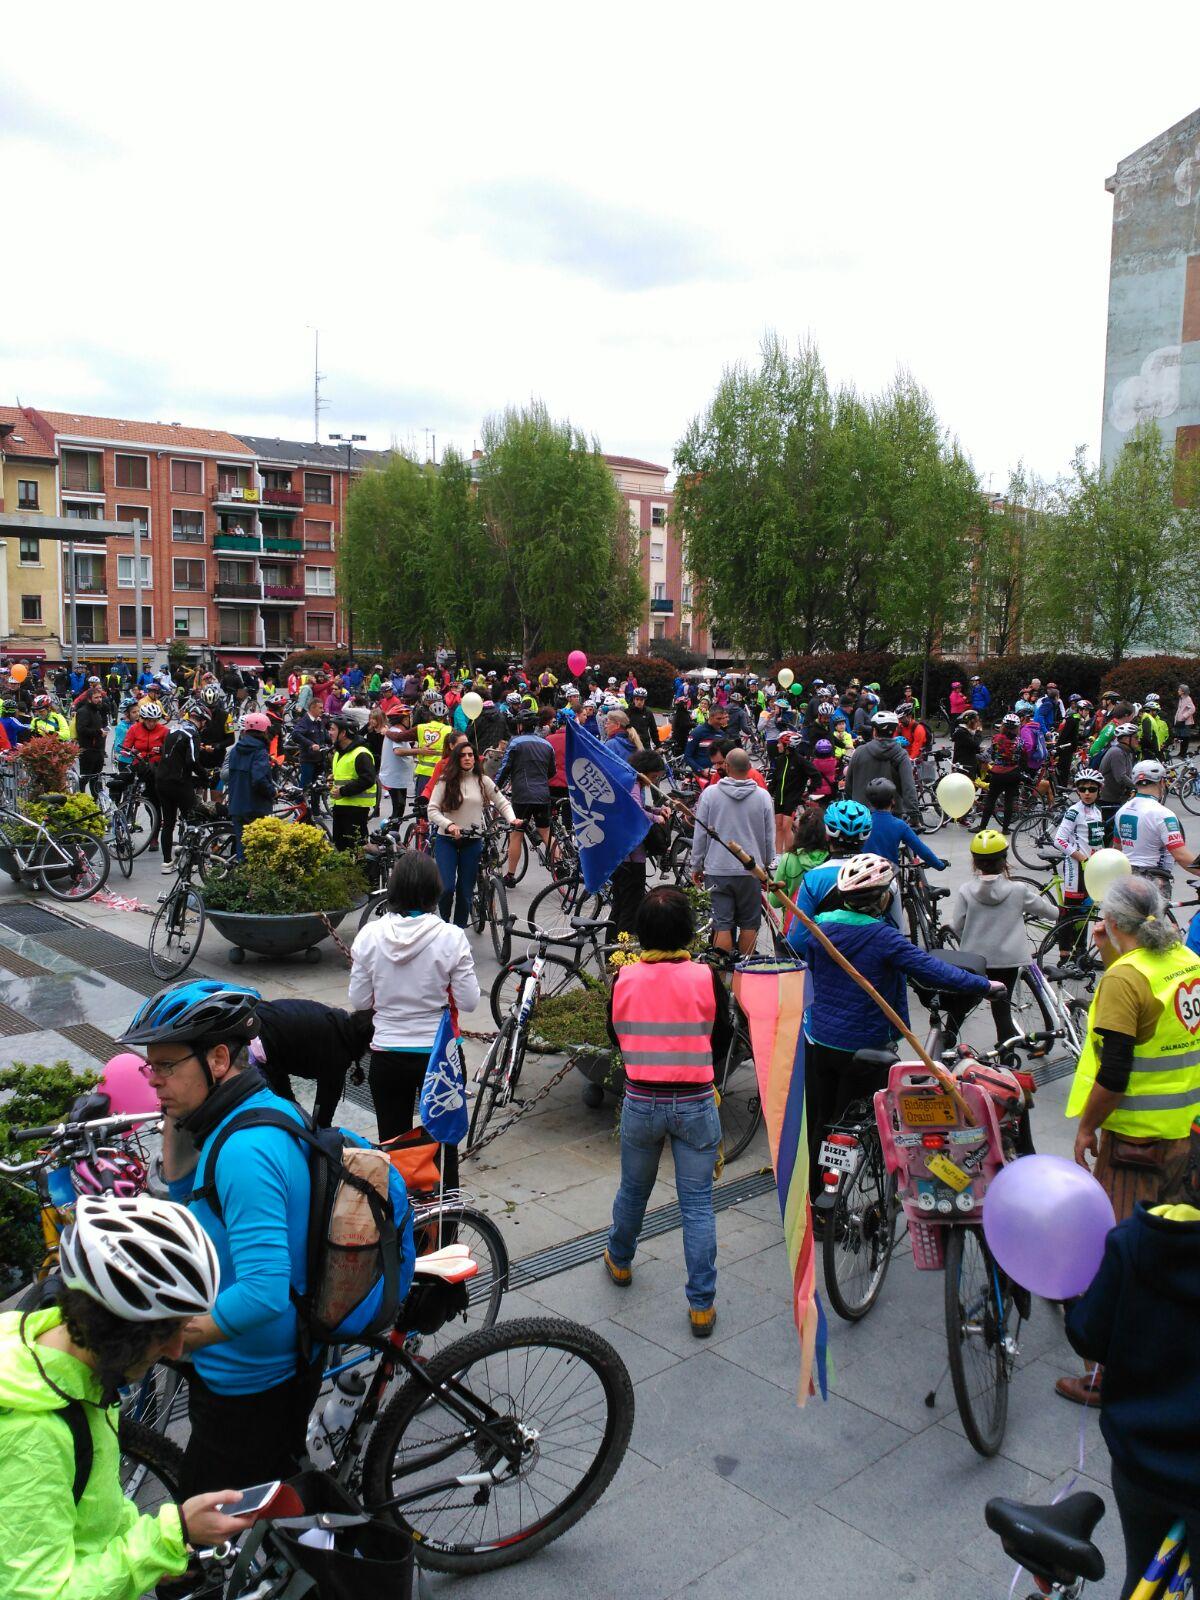 Crónica + vídeo + fotos: III Marcha de Bilbao al Mar